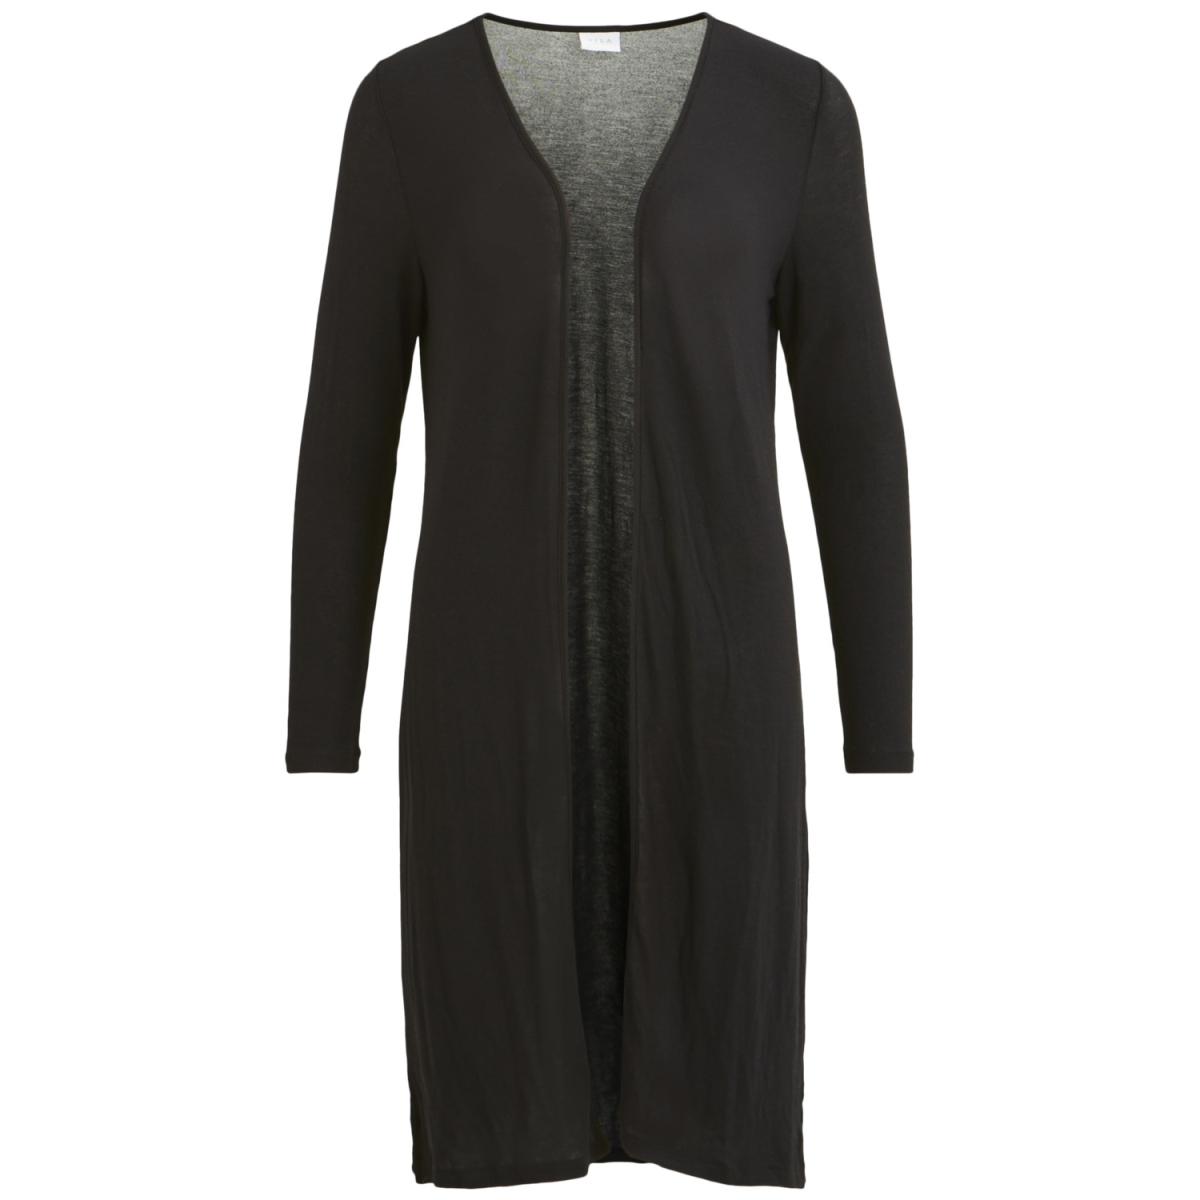 vinexa l/s cardigan - noos 14047364 vila vest black